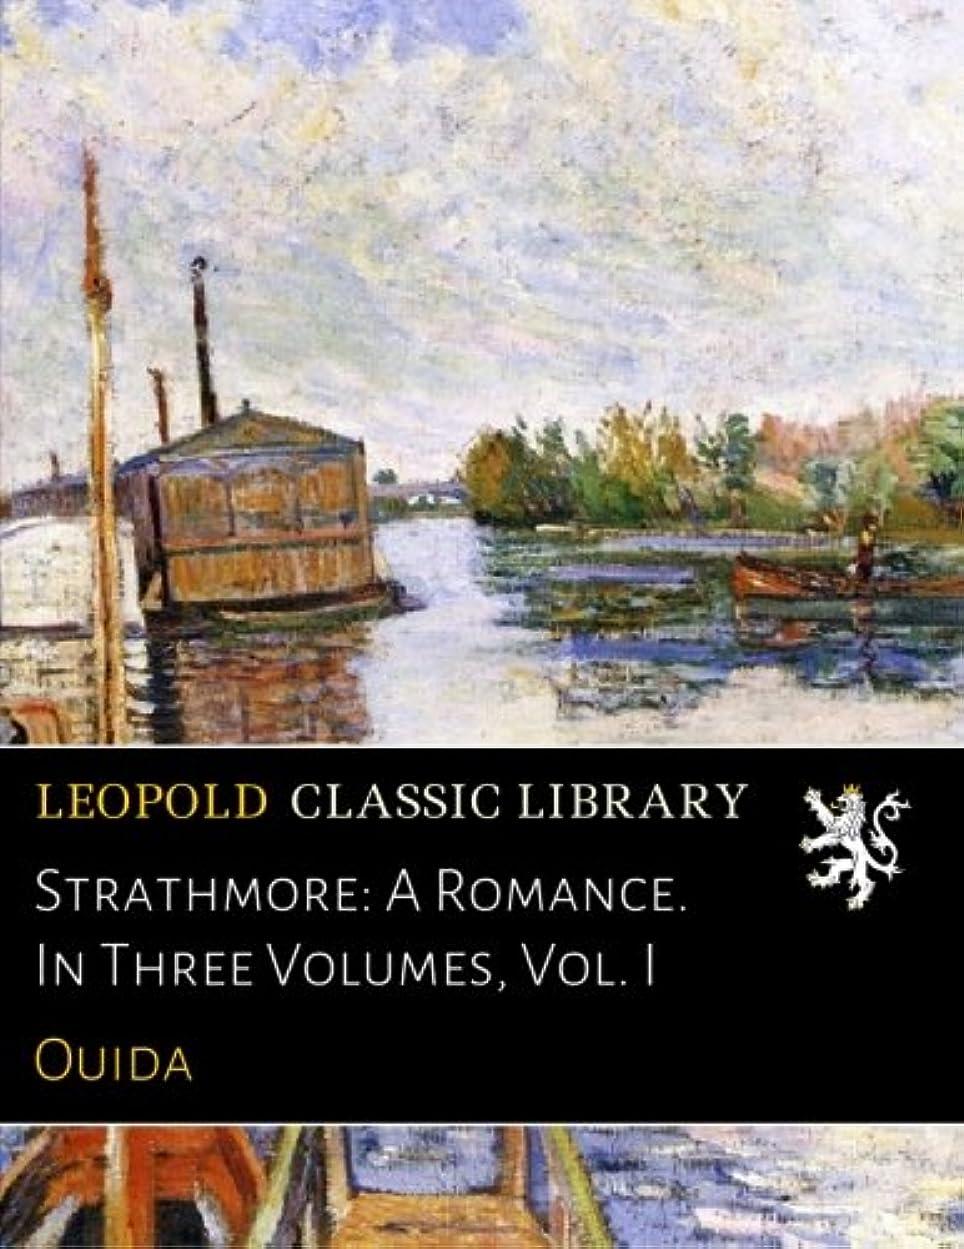 墓年推論Strathmore: A Romance. In Three Volumes, Vol. I